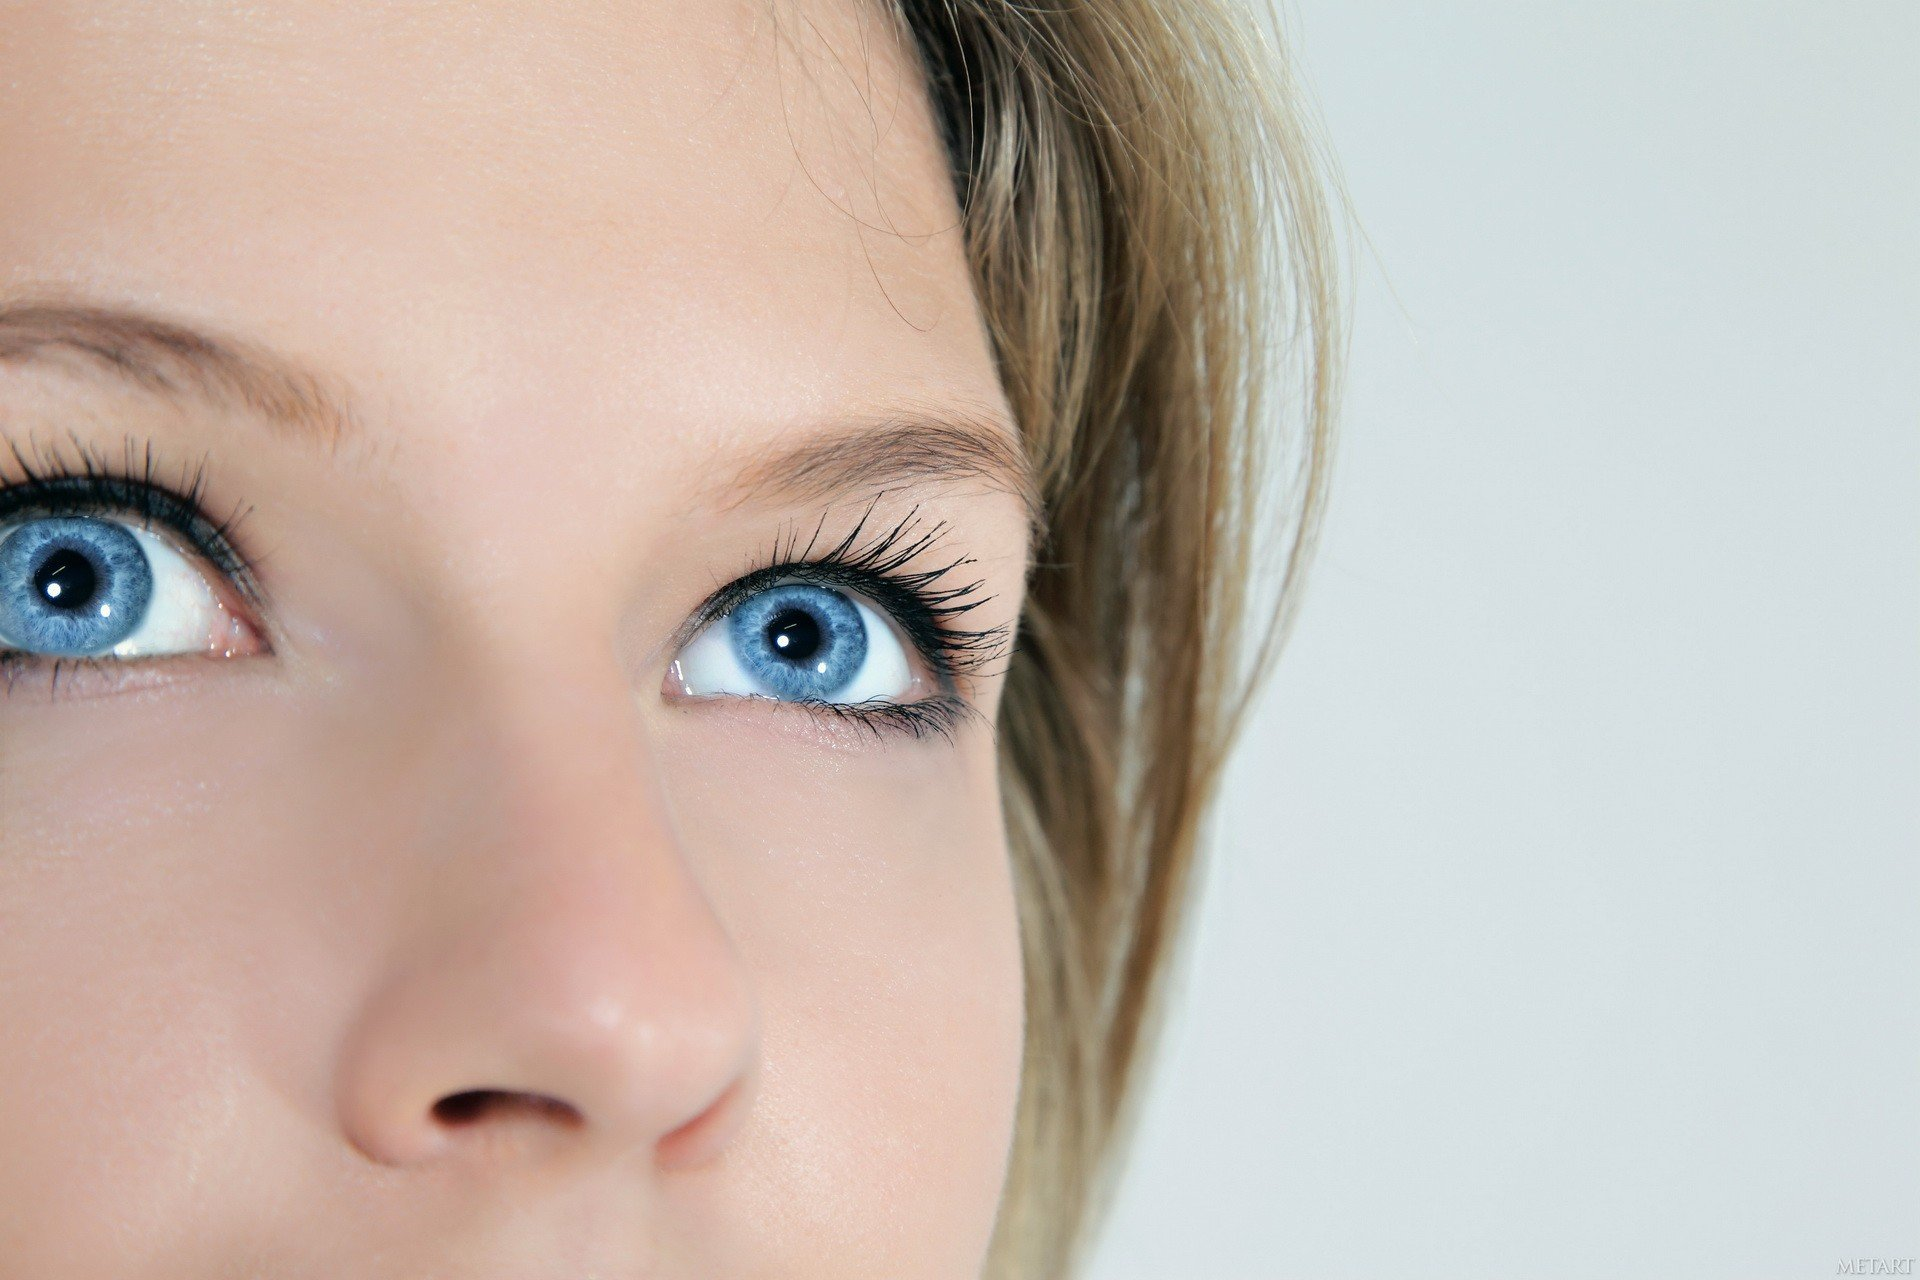 Catherine A., Women, Blonde, Blue eyes Wallpaper